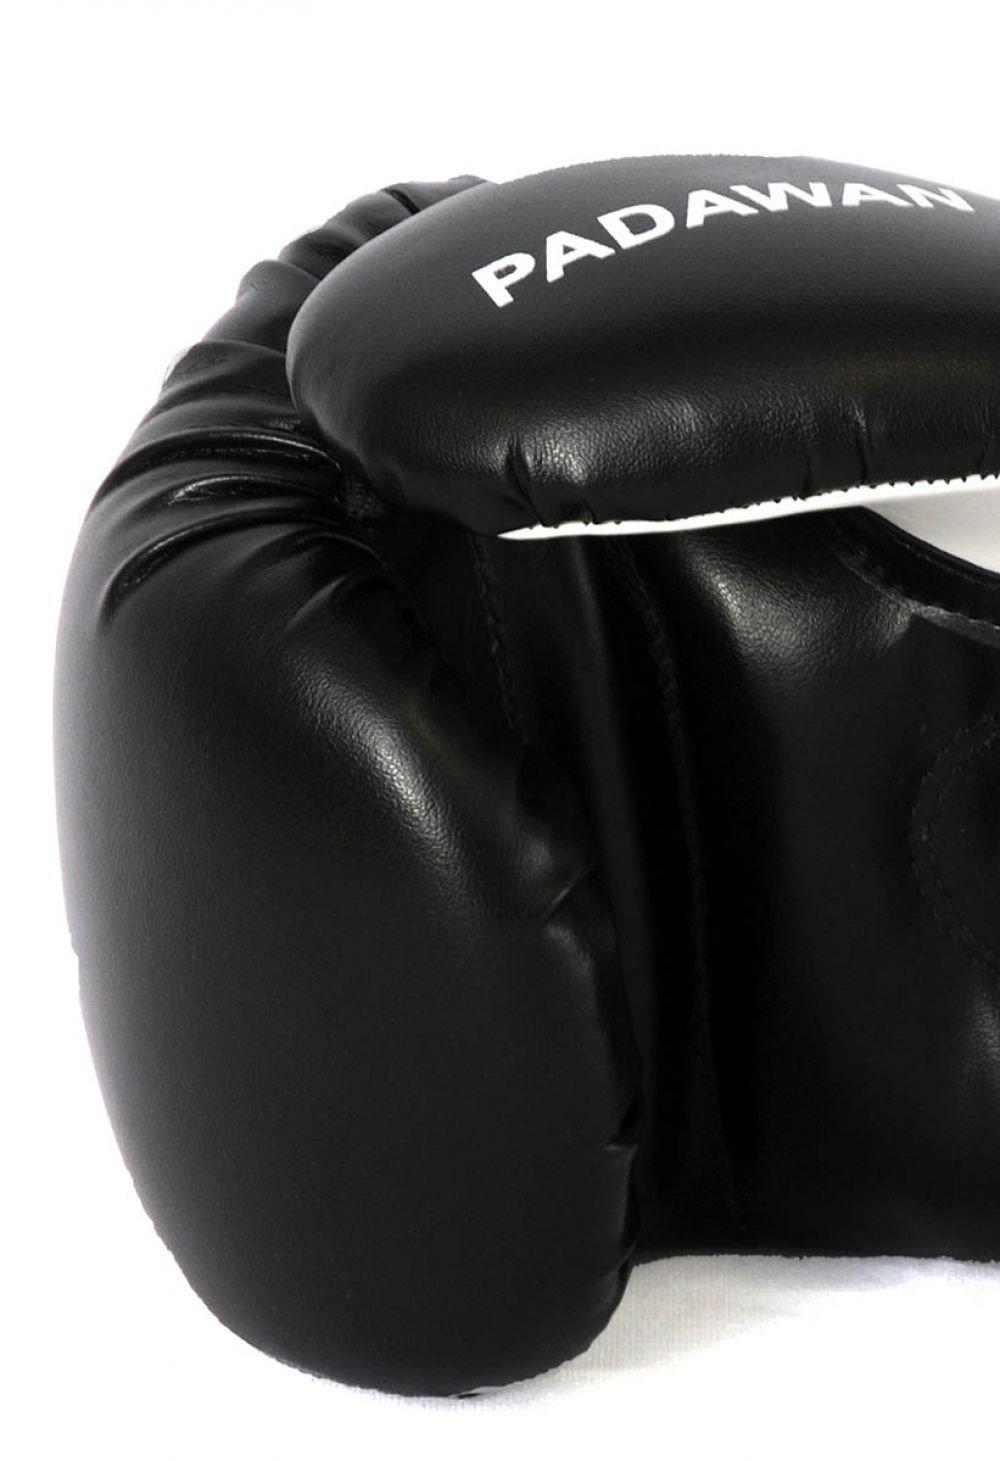 Gants de Boxe Padawan Noir